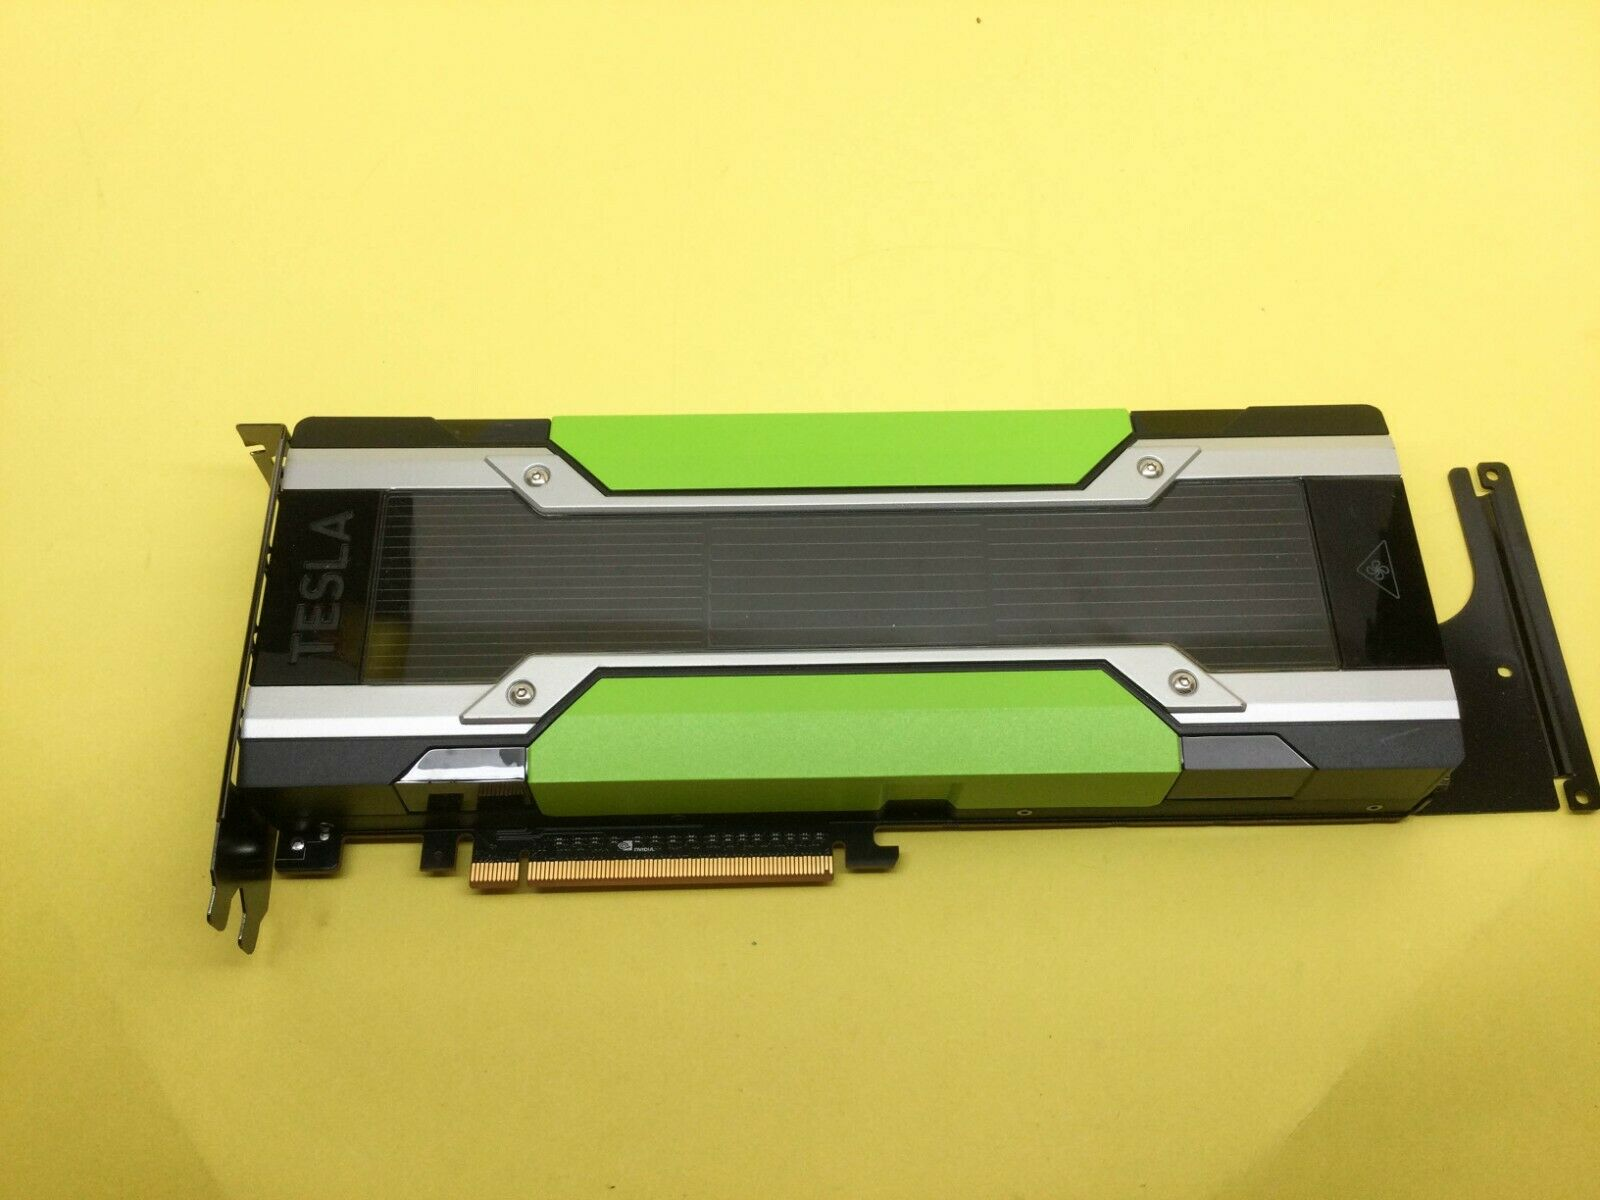 Nvidia Tesla M60 16GB GDDR5 GPU PCIe 3.0 x16 Accelerator Card with bracket